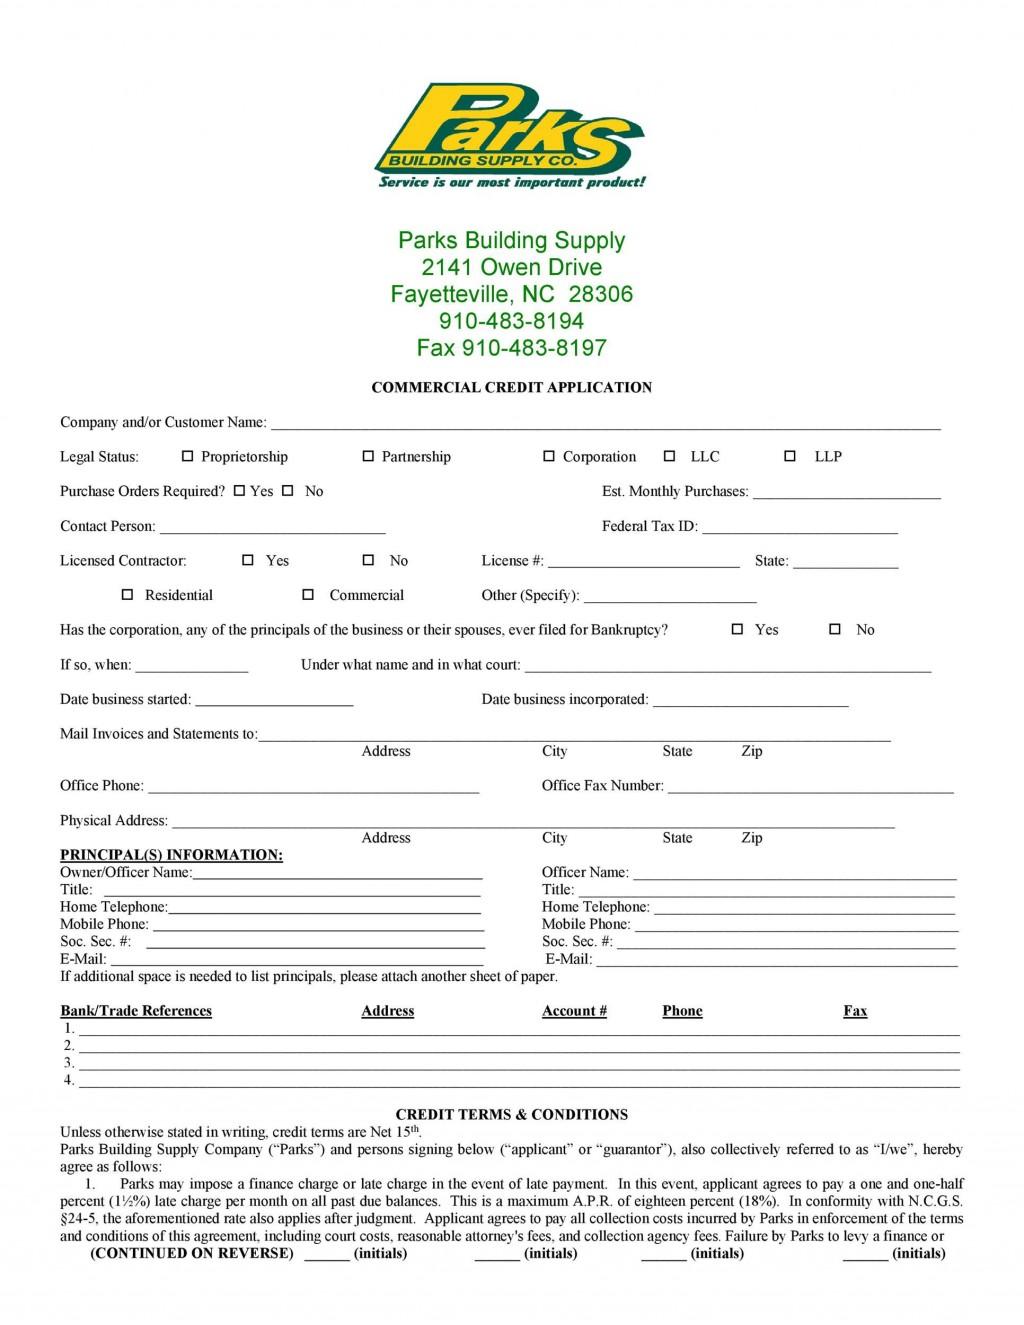 008 Unusual Busines Credit Application Form Free Idea  TemplateLarge